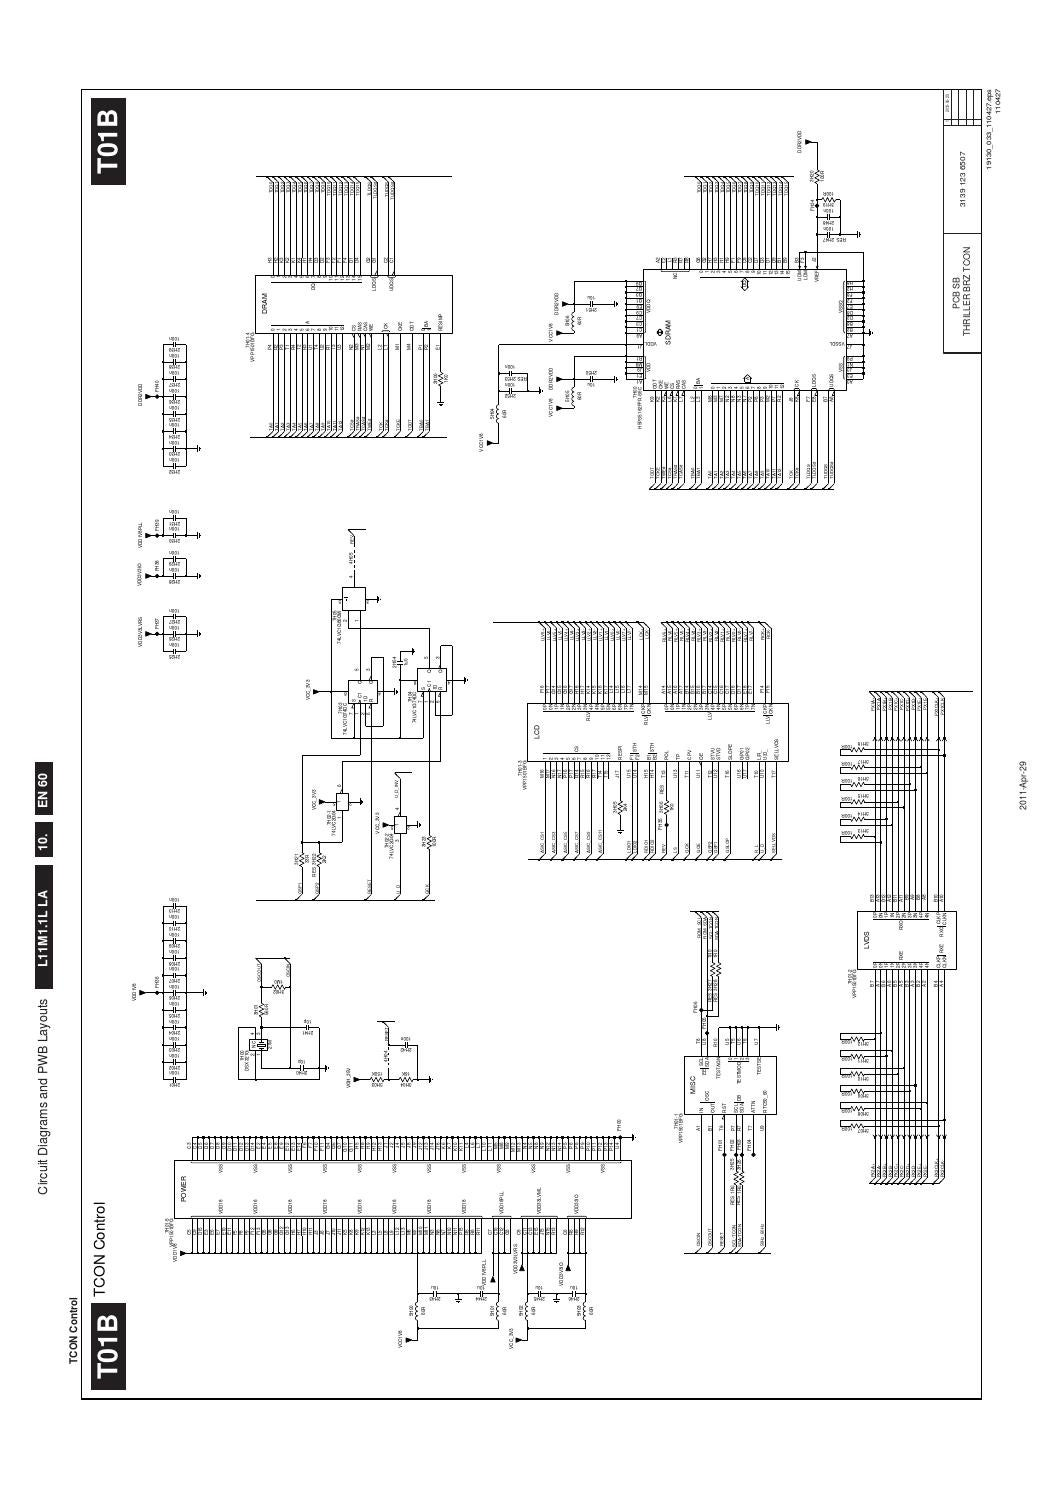 Manual de serviço televisores philips modelos 32pfl3606d e